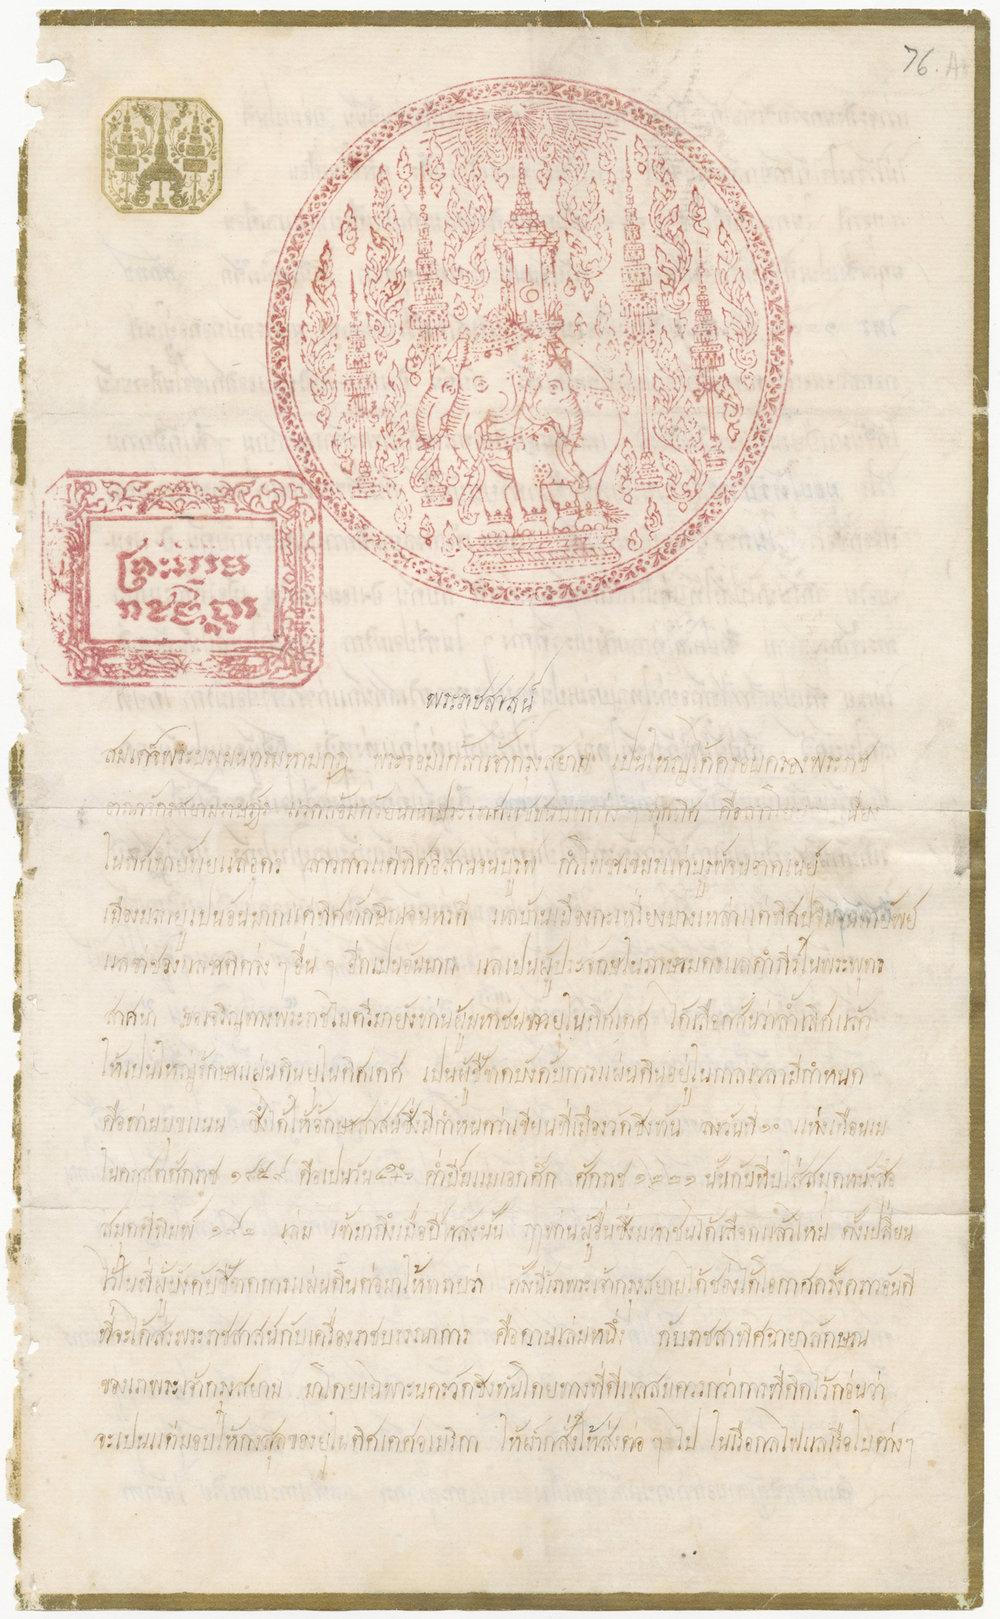 Letter from King Mongkut to President James Buchanan, 1861 Courtesy of the National Archives and Records Administration, General Records of the United States Government; 6923529  พระราชสาส์นในพระบาทสมเด็จพระจอมเกล้าเจ้าอยู่หัว พระราชทานแก่ประธานาธิบดีเจมส์ บูแคนัน พ.ศ. ๒๔๐๔ ได้รับความอนุเคราะห์จากแผนกบันทึกทั่วไปของรัฐบาลสหรัฐอเมริกา องค์การบริหารจดหมายเหตุและบันทึกแห่งชาติ; 6923529